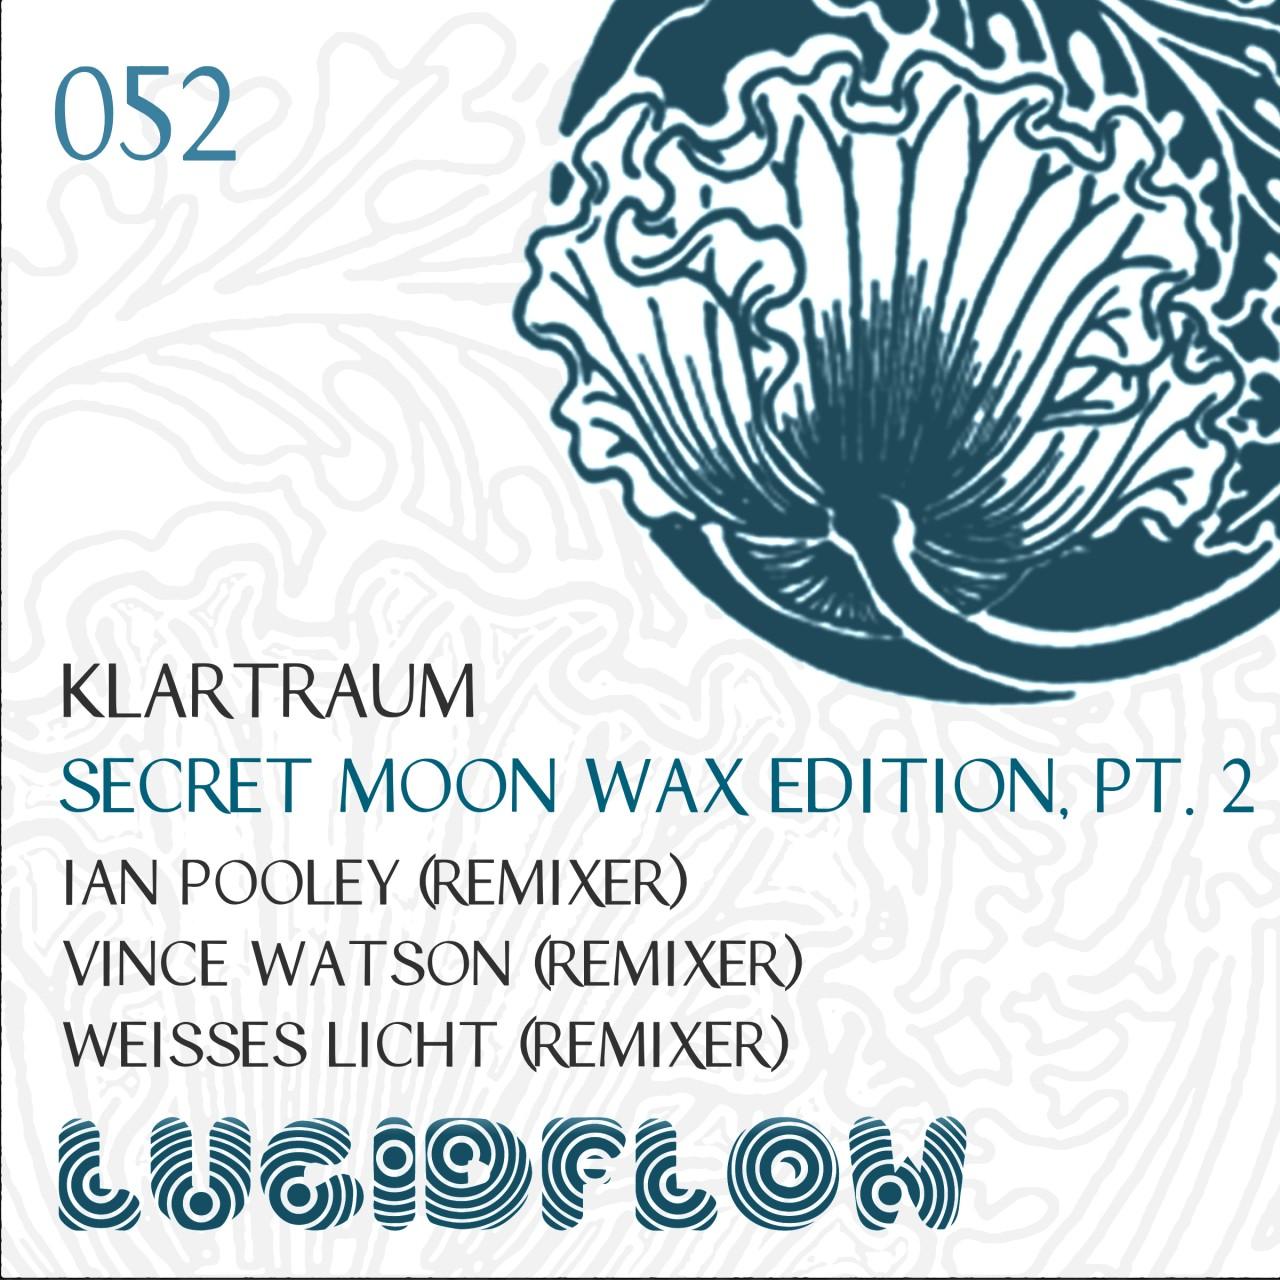 LF052 – Klartraum – Secret Moon Wax Edition Pt. 2